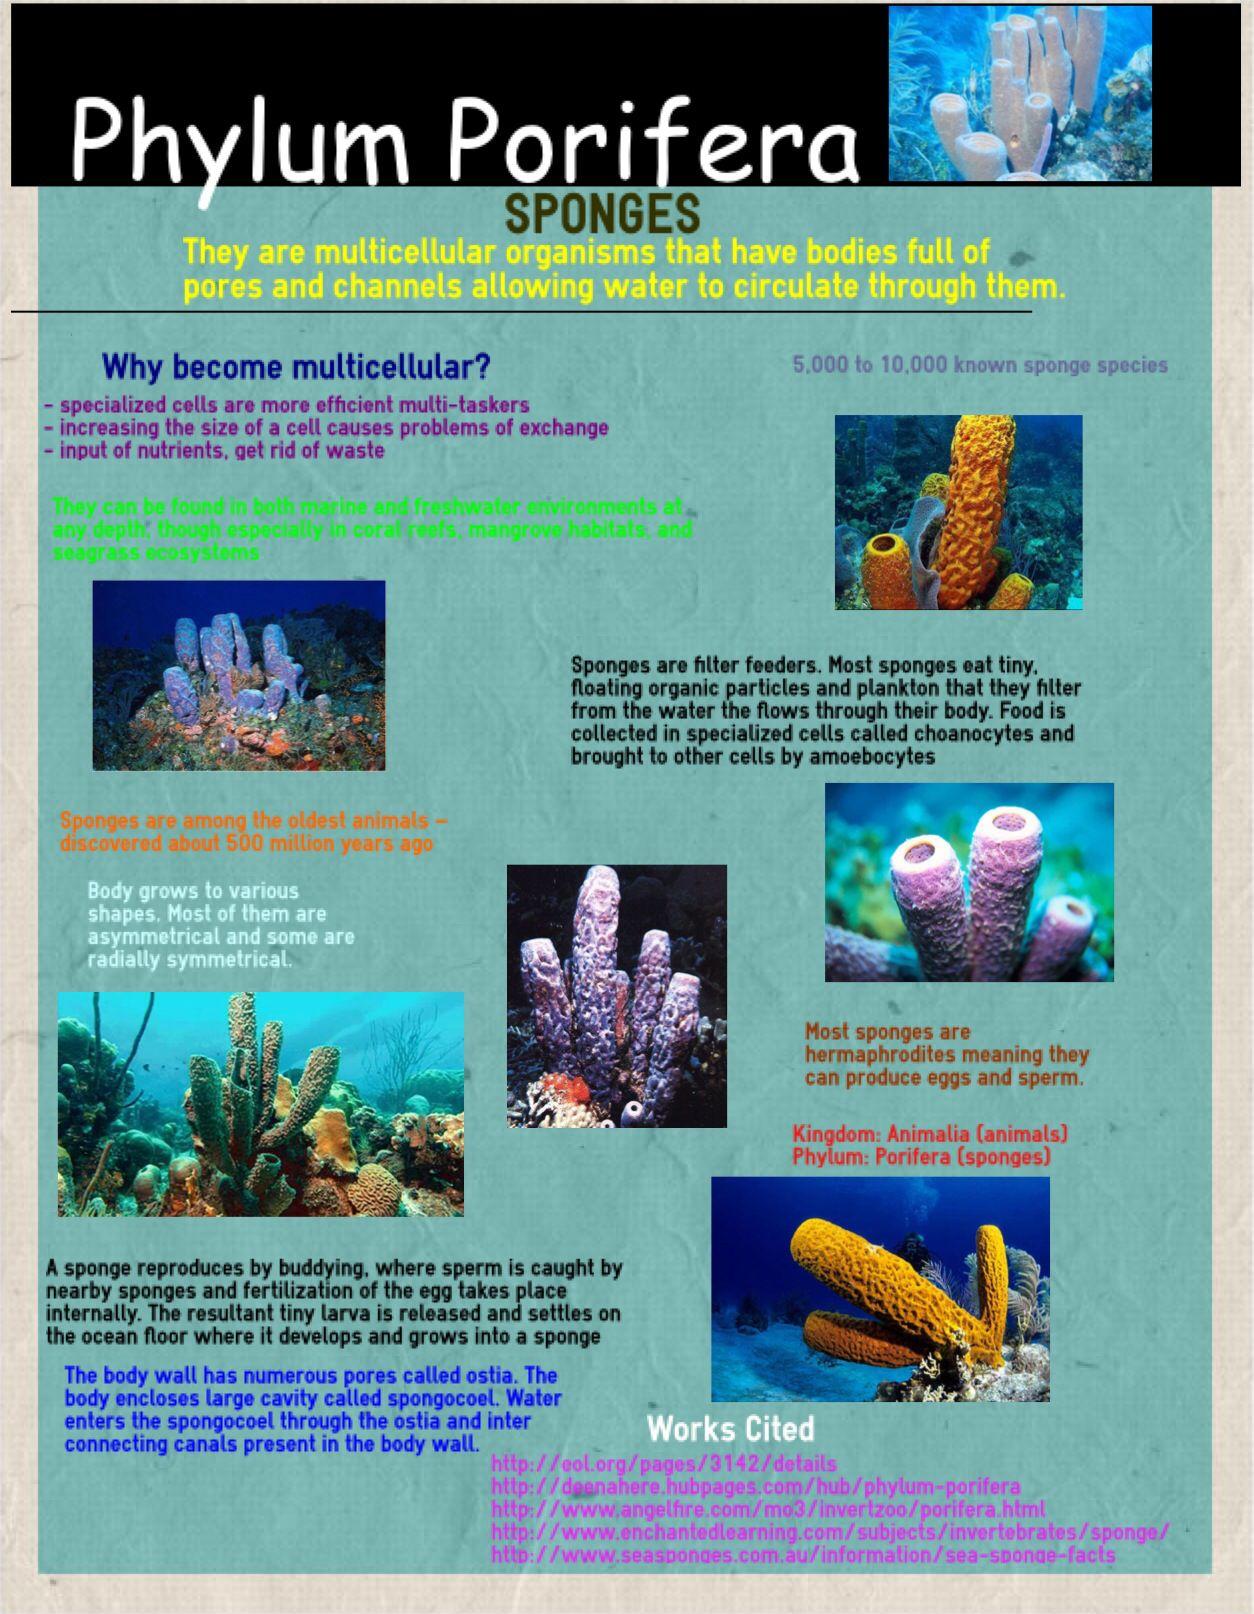 Phylum Porifera- Taylor Lipinski Block 6 | Science and biology ...